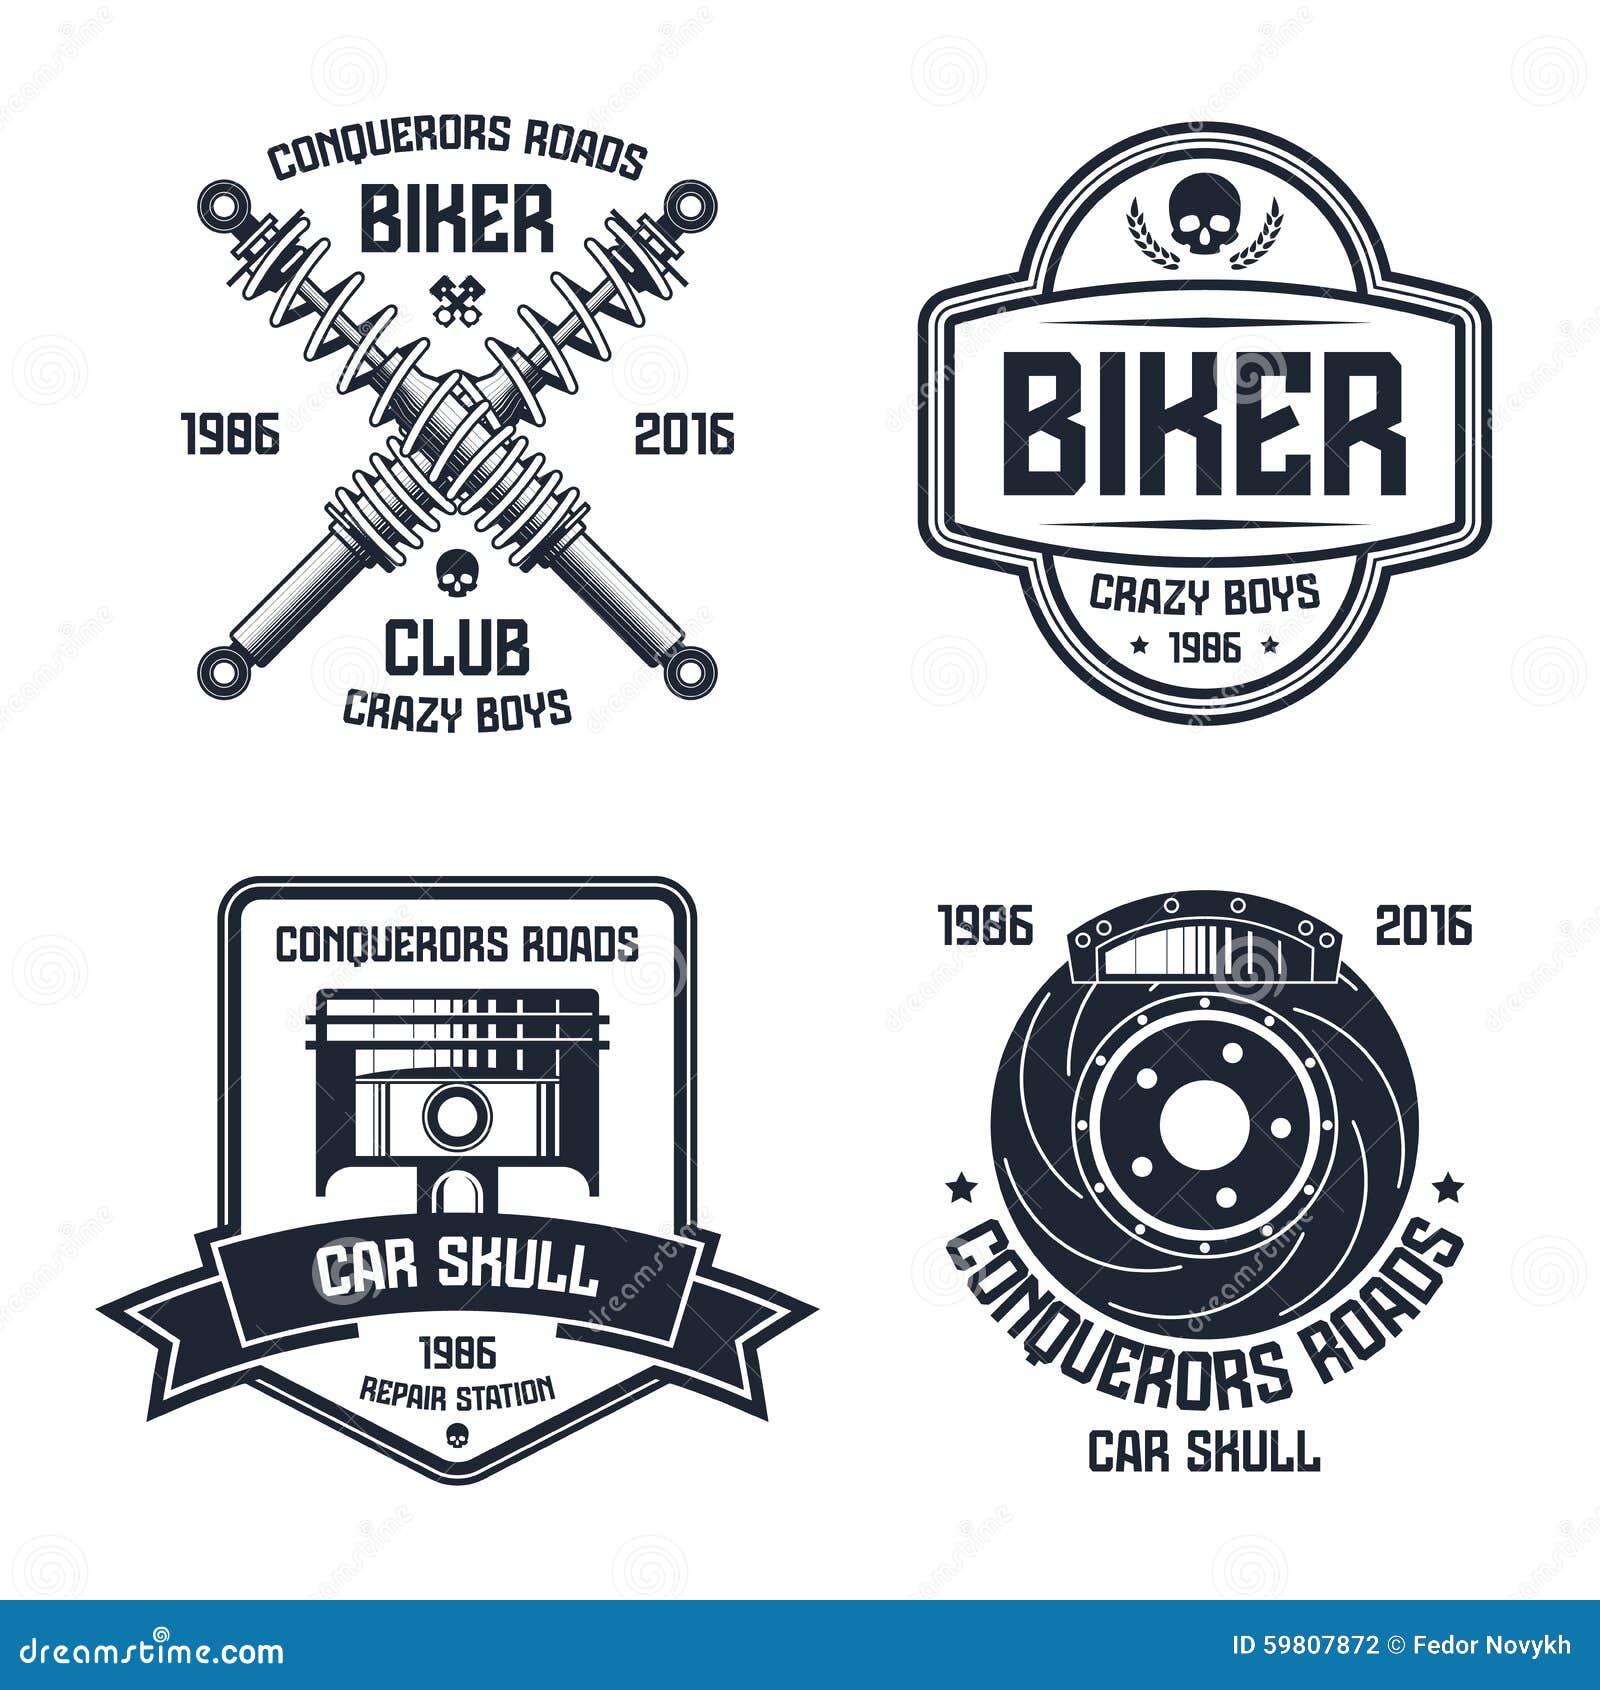 Design car club logo - Car Repair And Biker Club Emblems